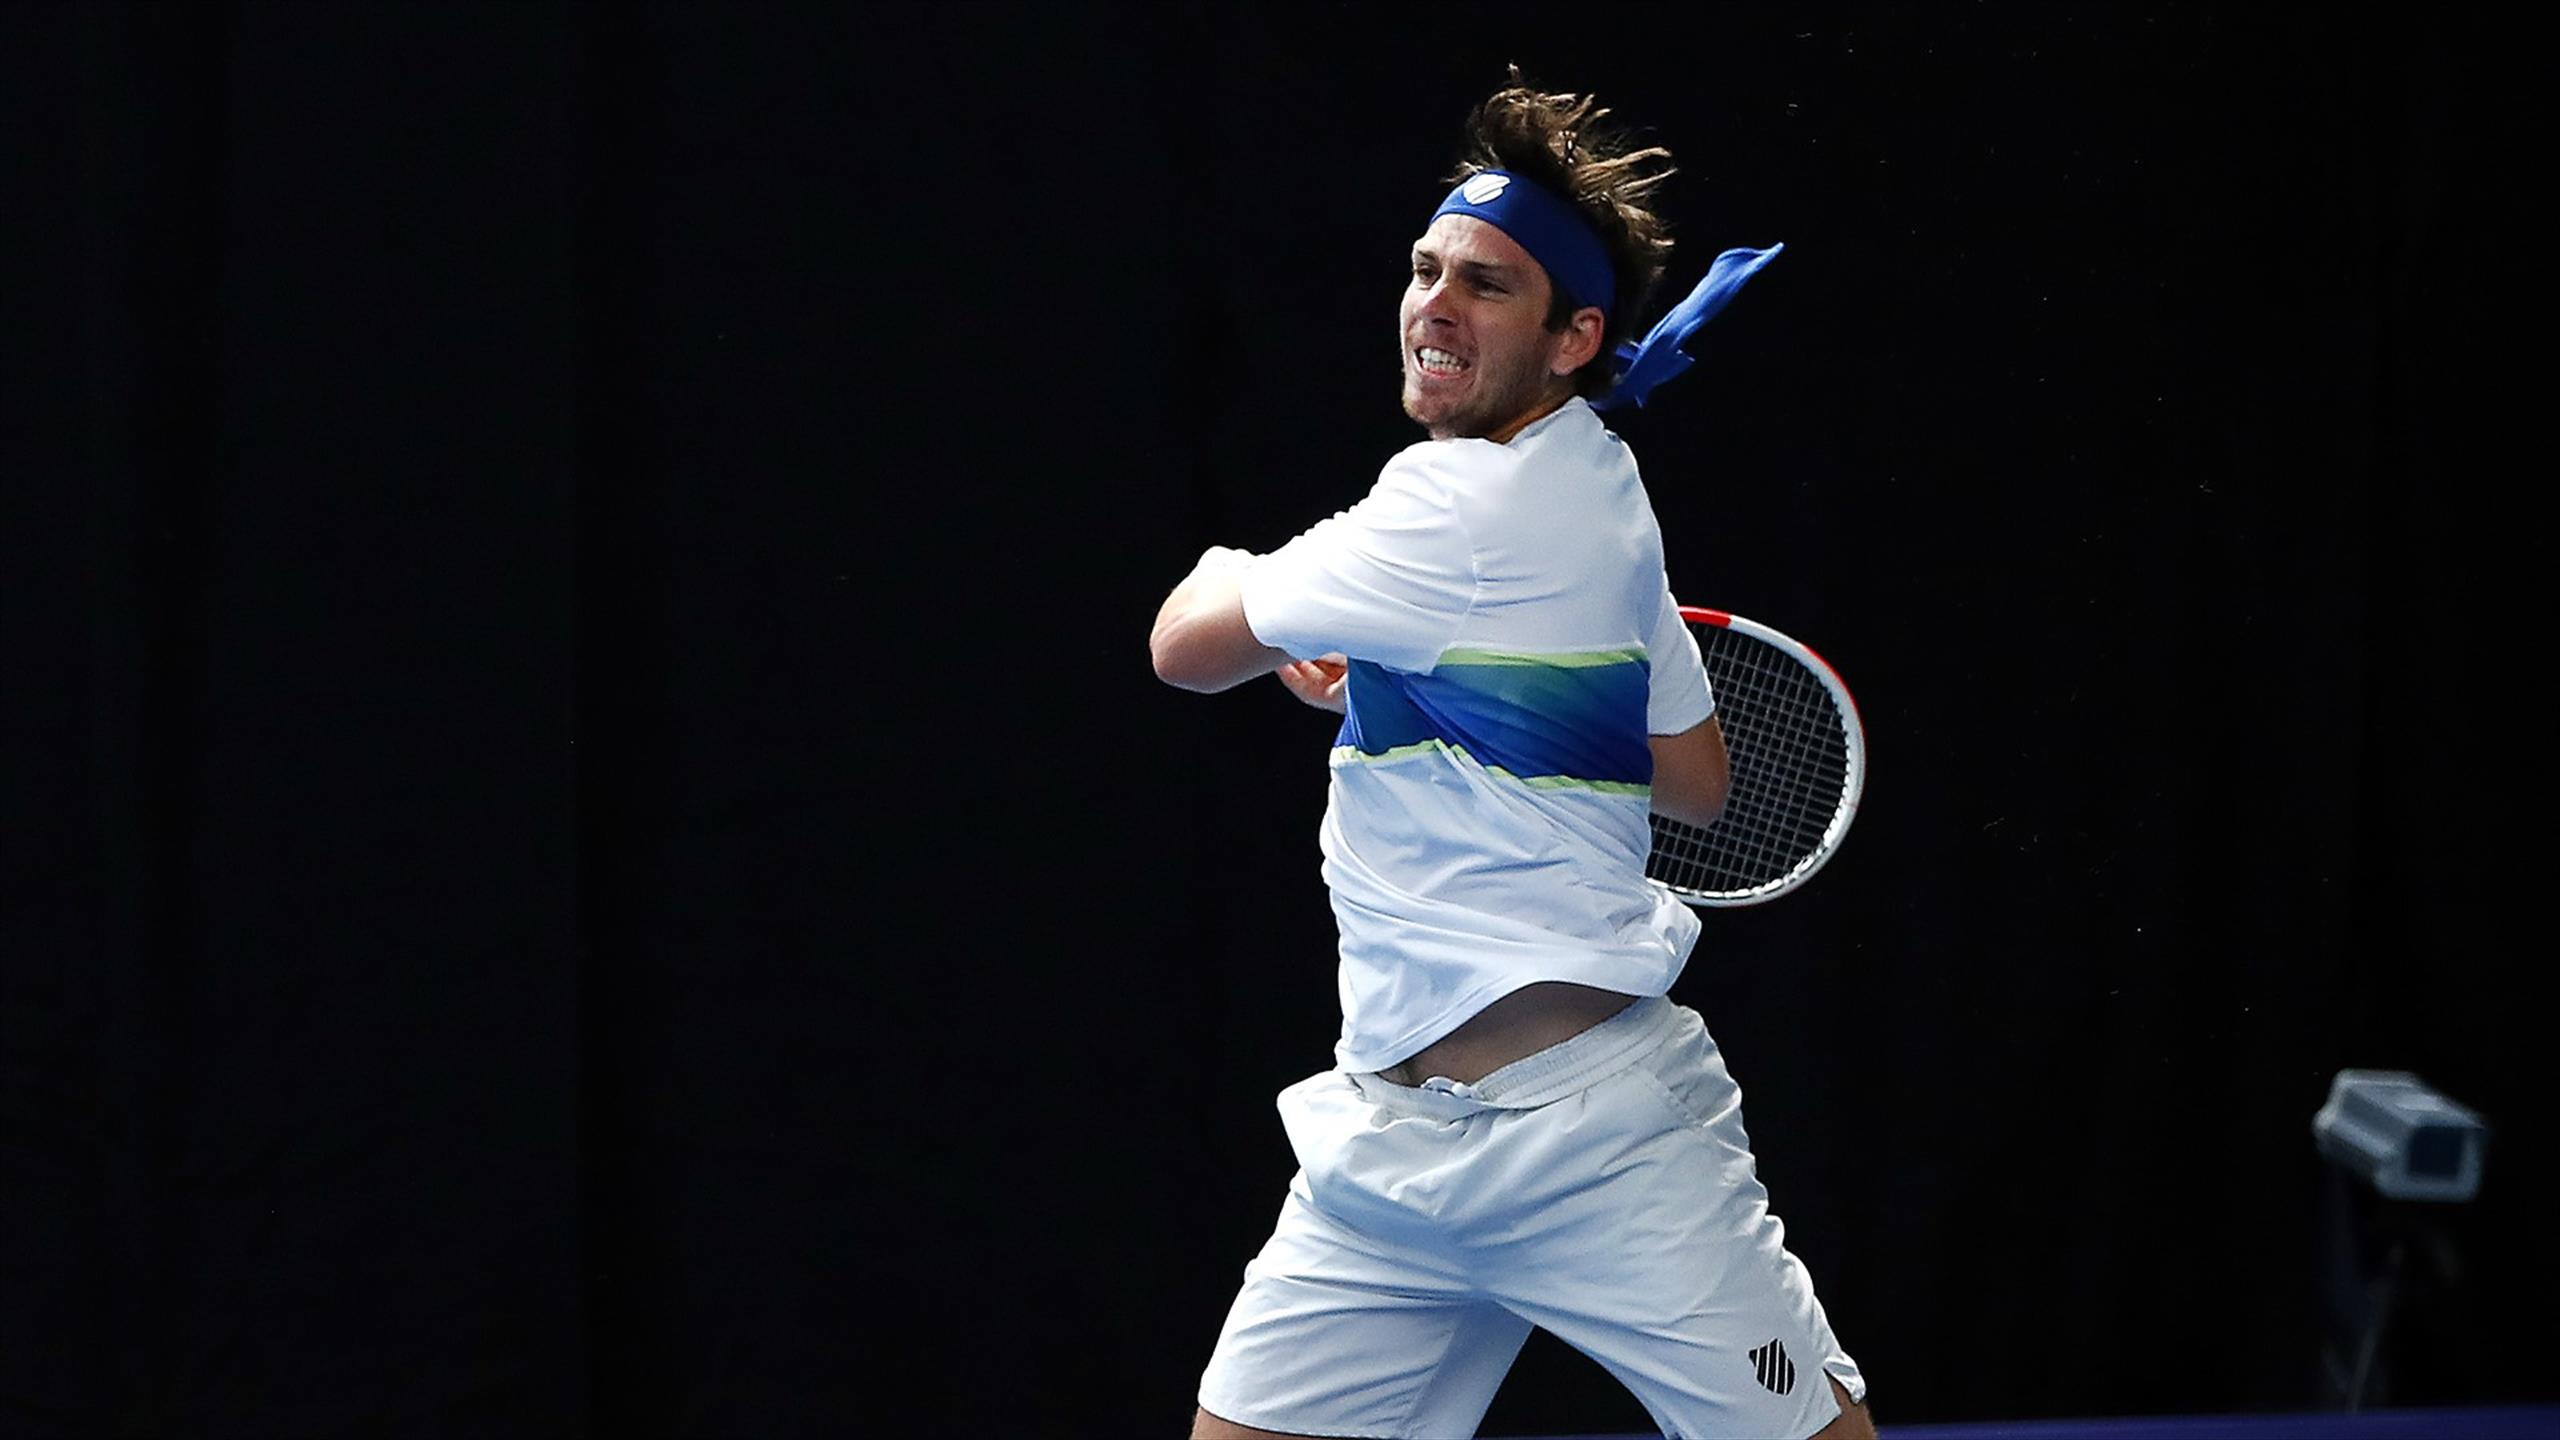 Cameron Norrie On Stunning Diego Schwartzman Victory The Tennis Wasn T Great Eurosport